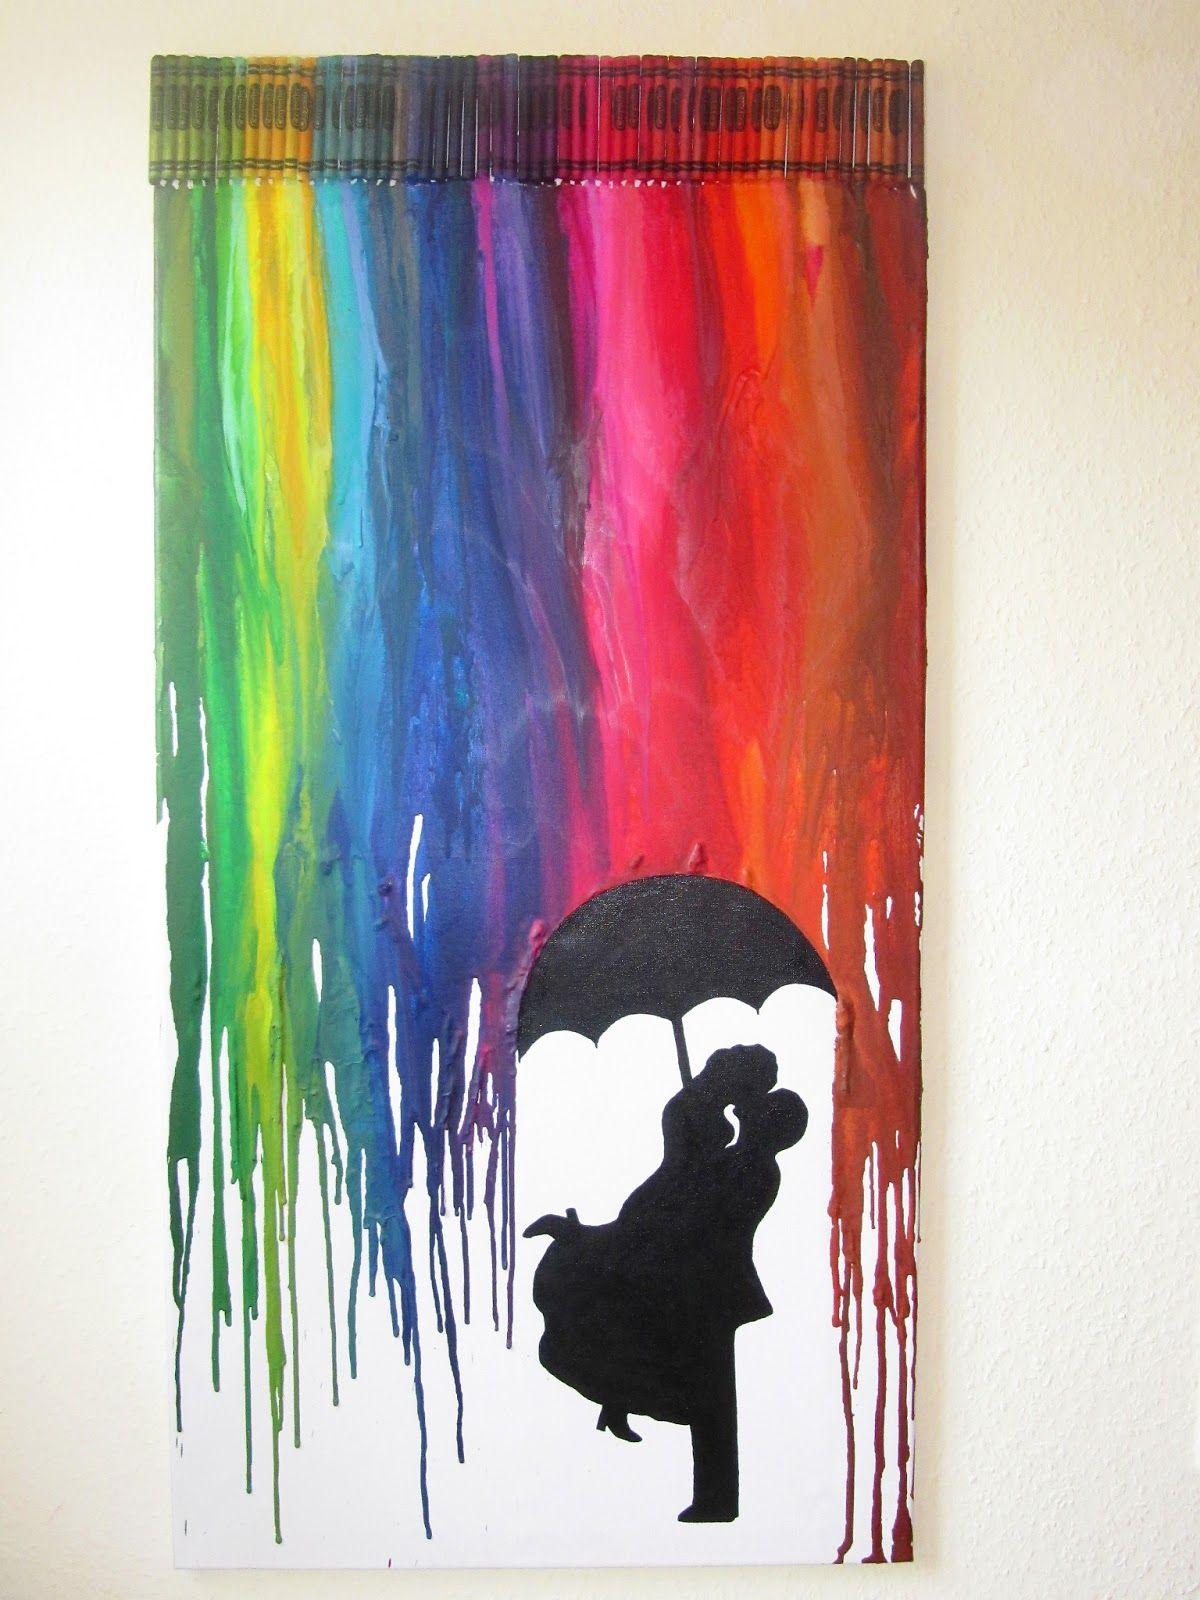 crayon art, kunst aus wachsmalstiften, föhn, schmelzen, regenschirm